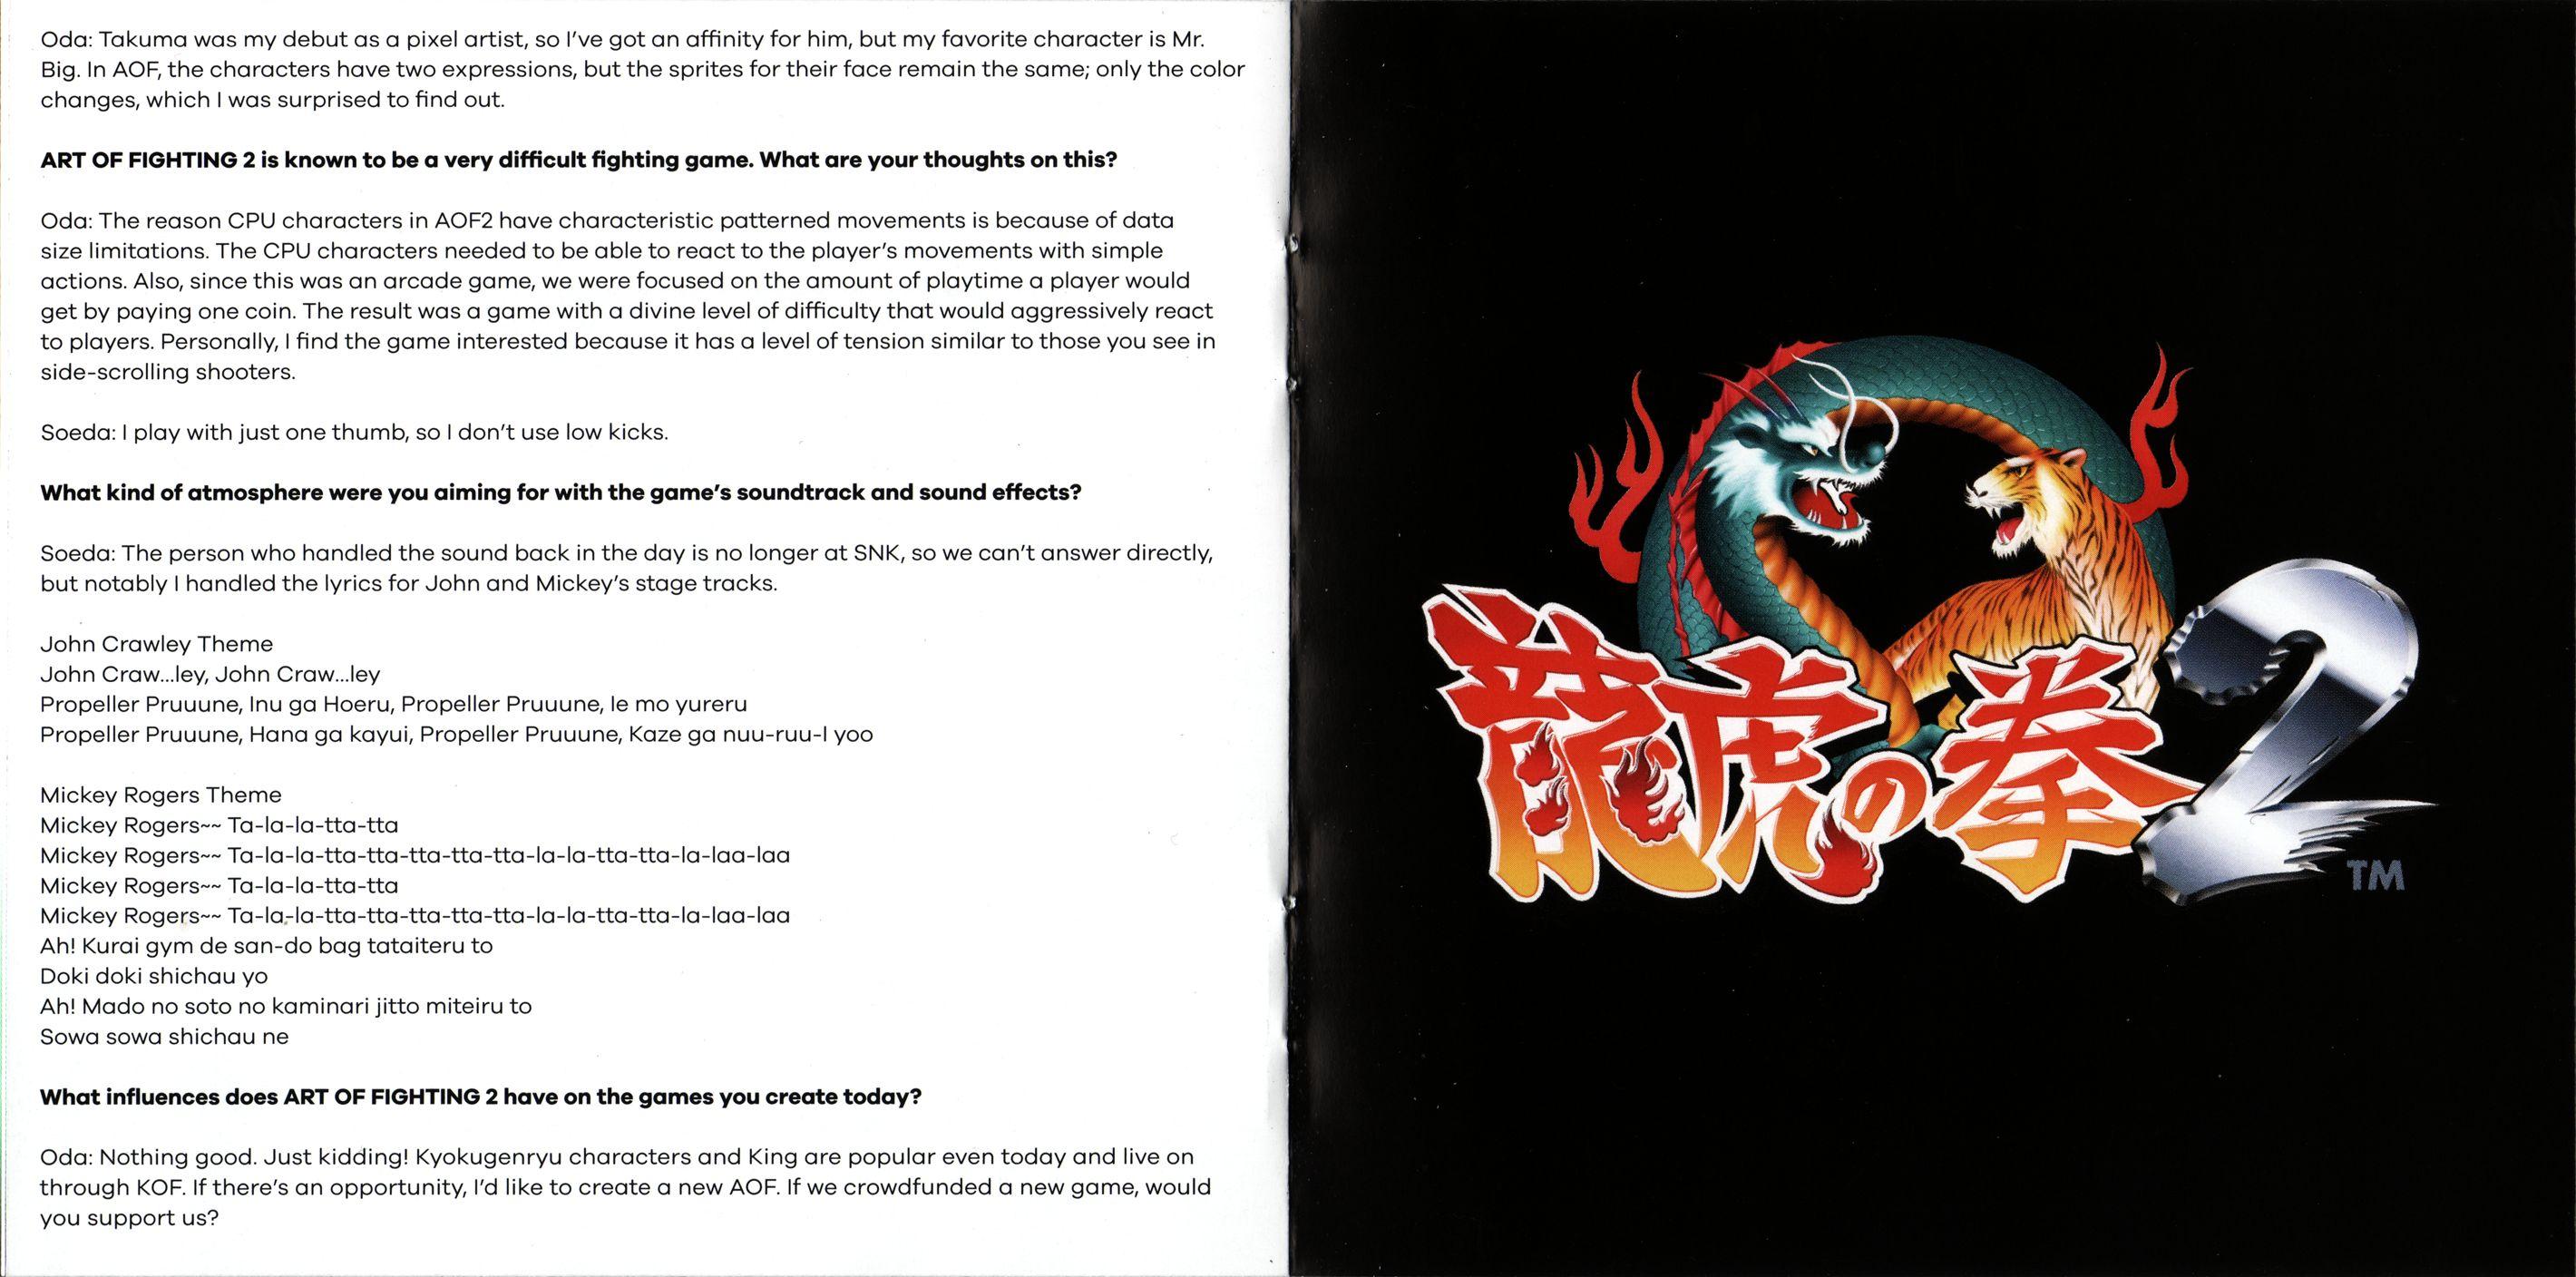 Art Of Fighting 2 The Definitive Soundtrack Muzyka Iz Igry